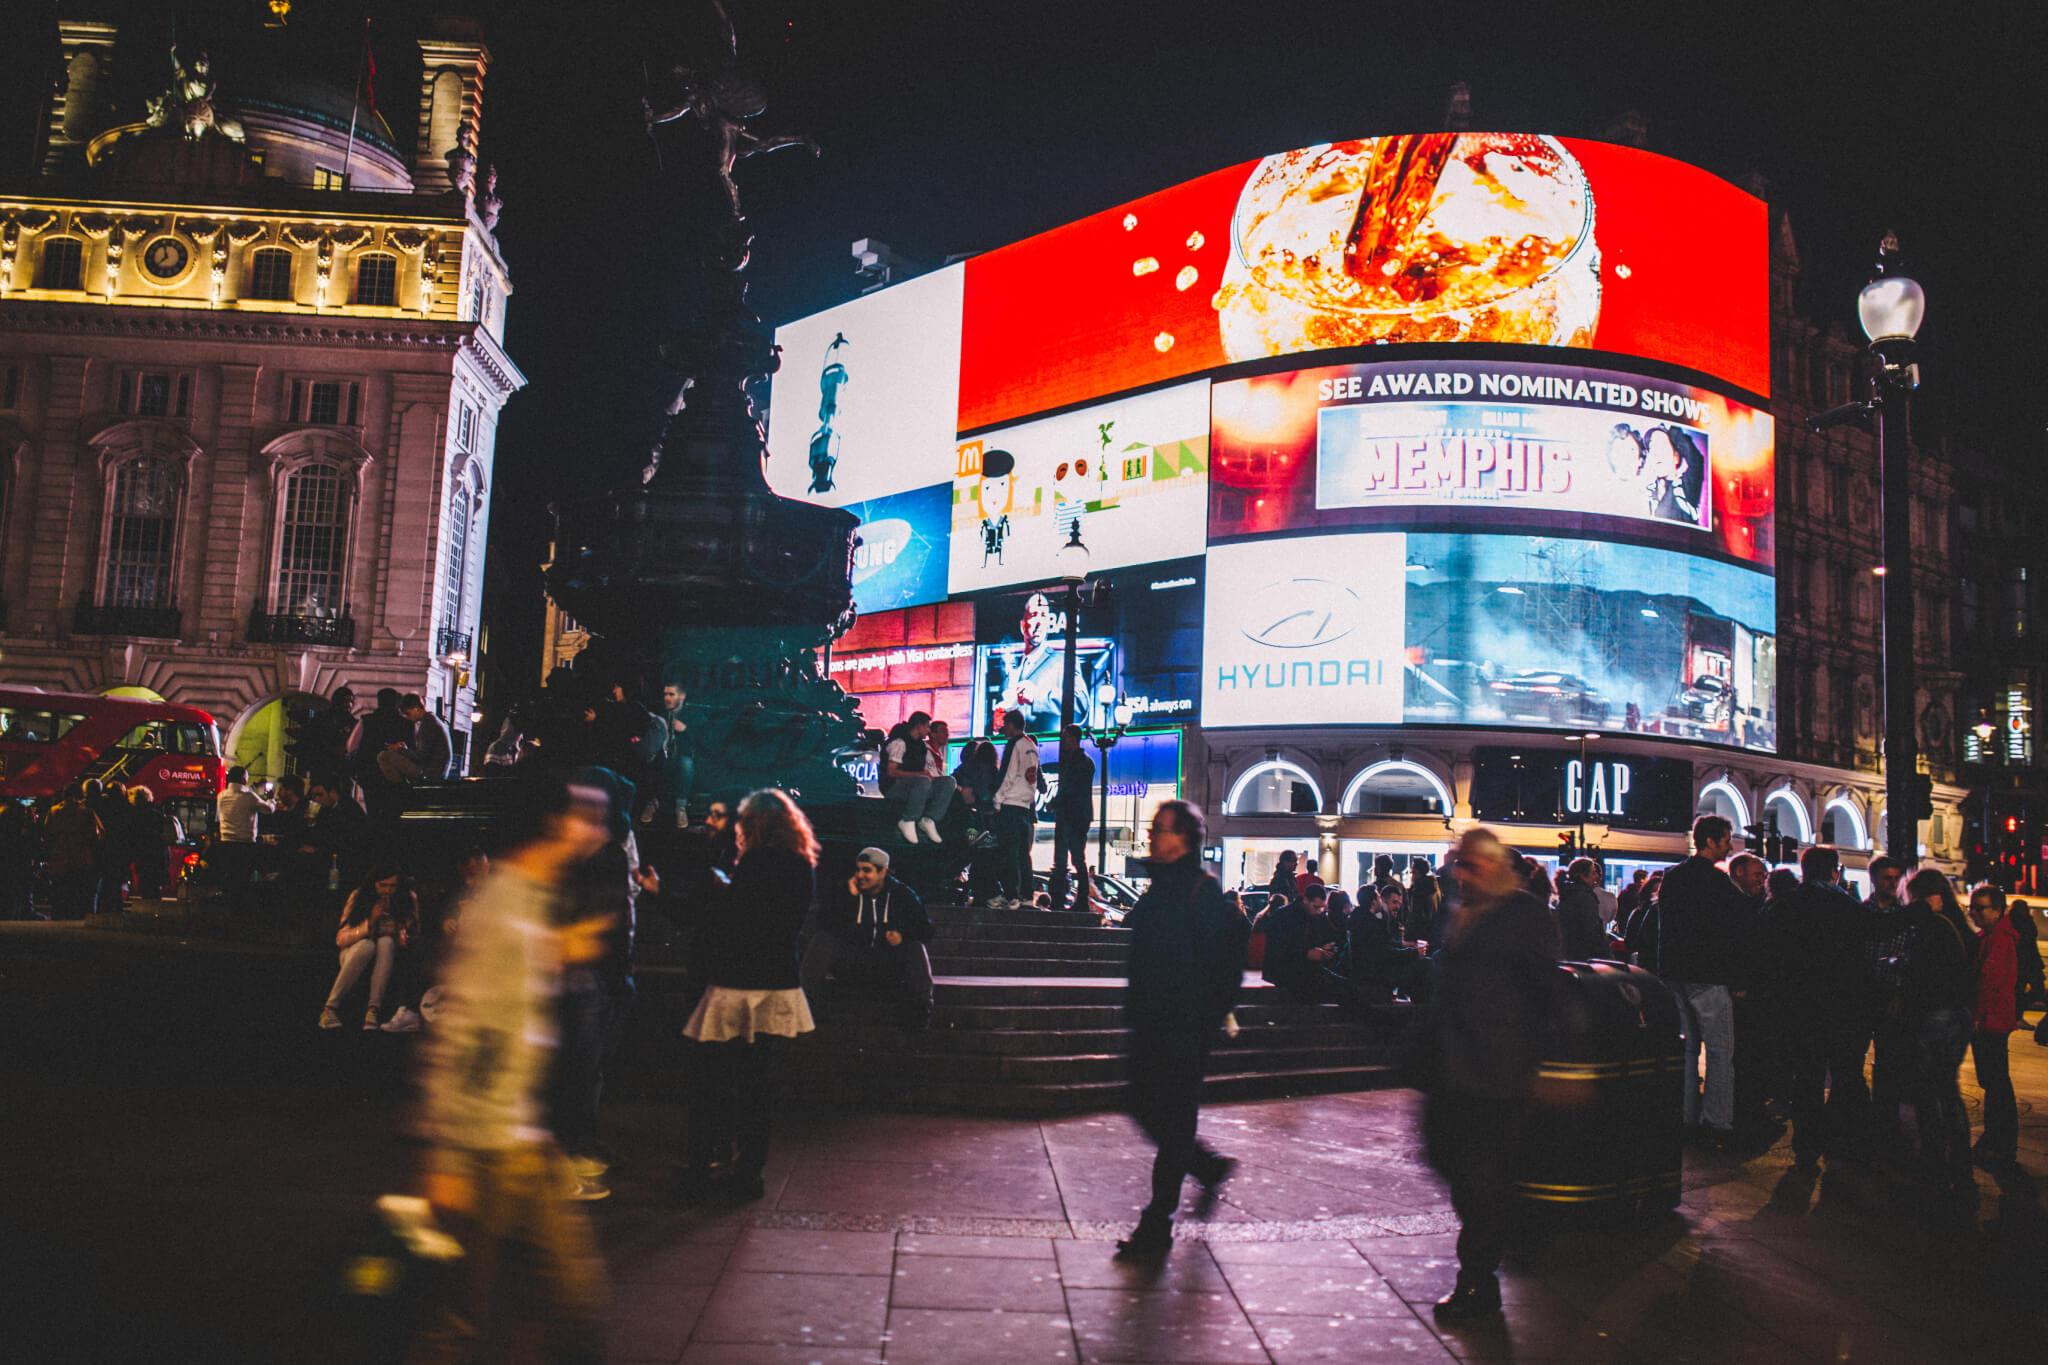 British Tourism London - PR Agency